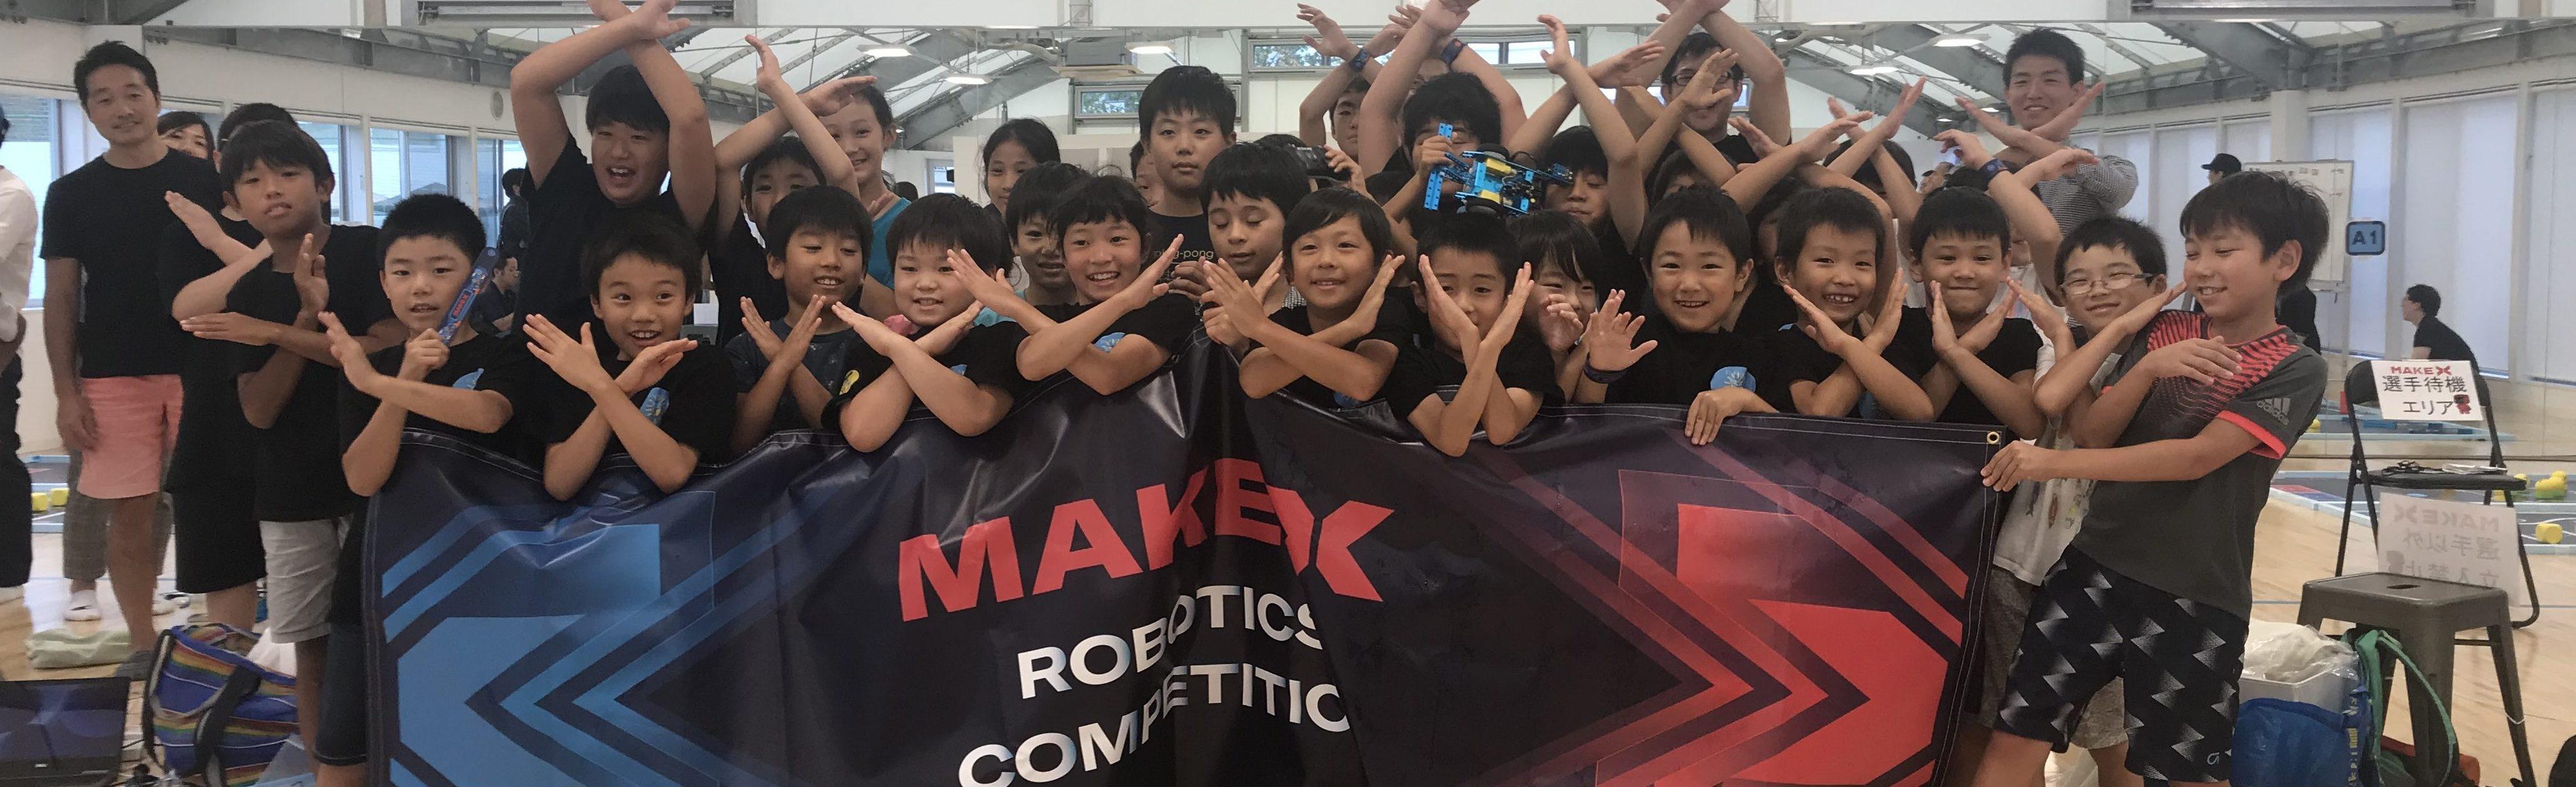 チーム『BONO』MakeX2019東京大会優勝で世界大会出場権獲得!